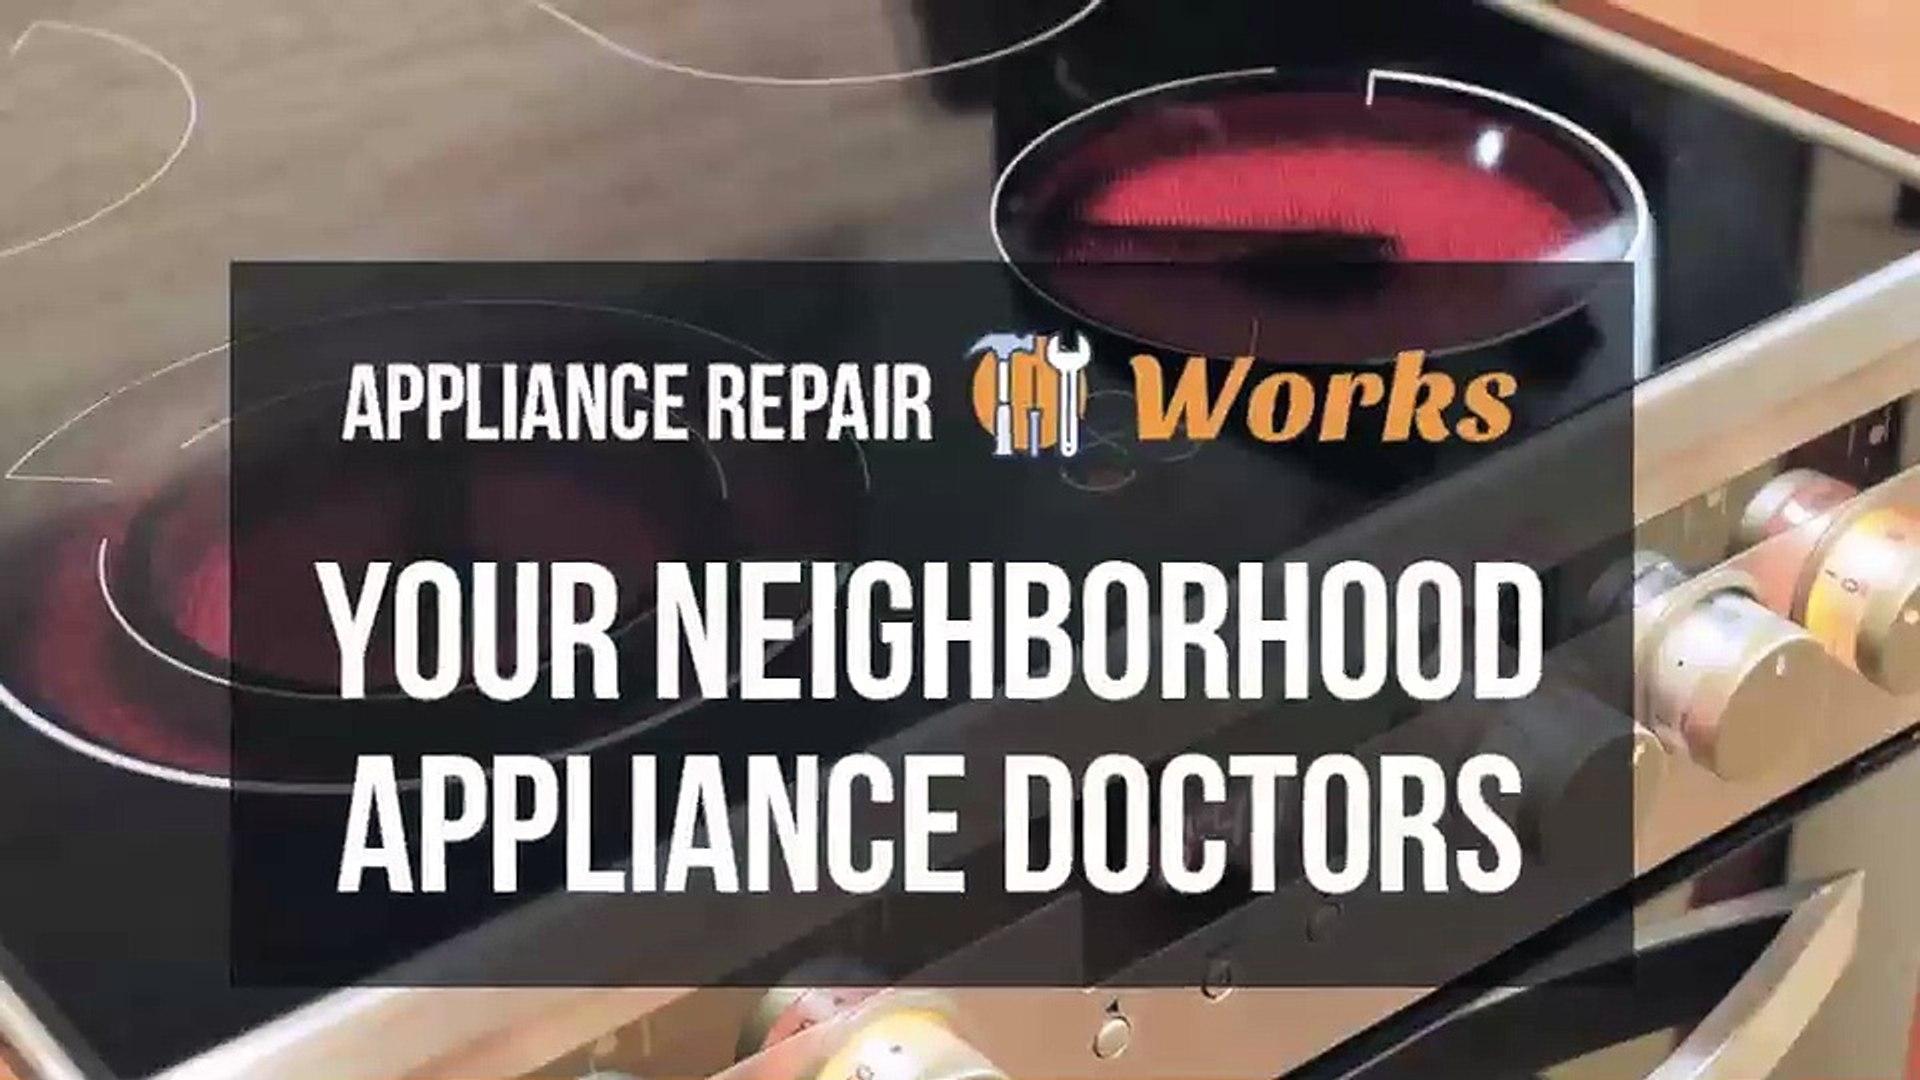 Paramount Appliance Repair Works-(562) 200-0940